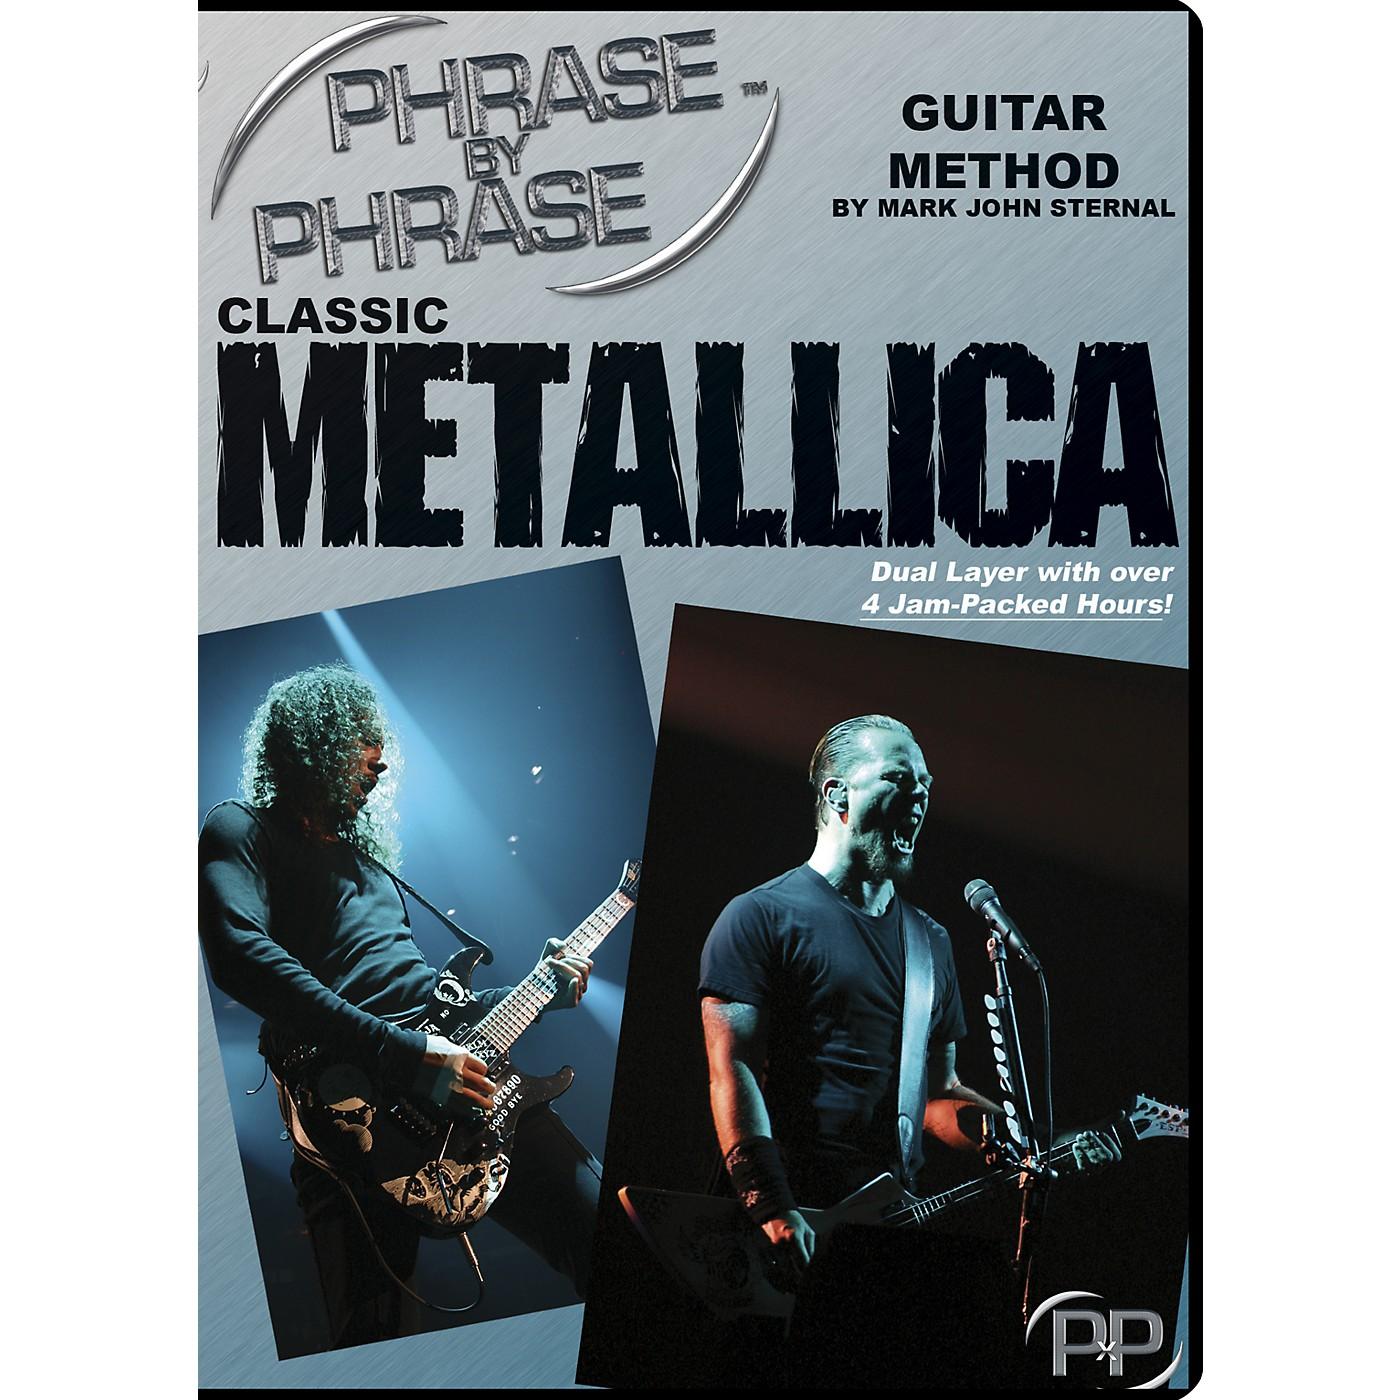 MJS Music Publications Classic Metallica: Phrase by Phrase Guitar Method DVD thumbnail